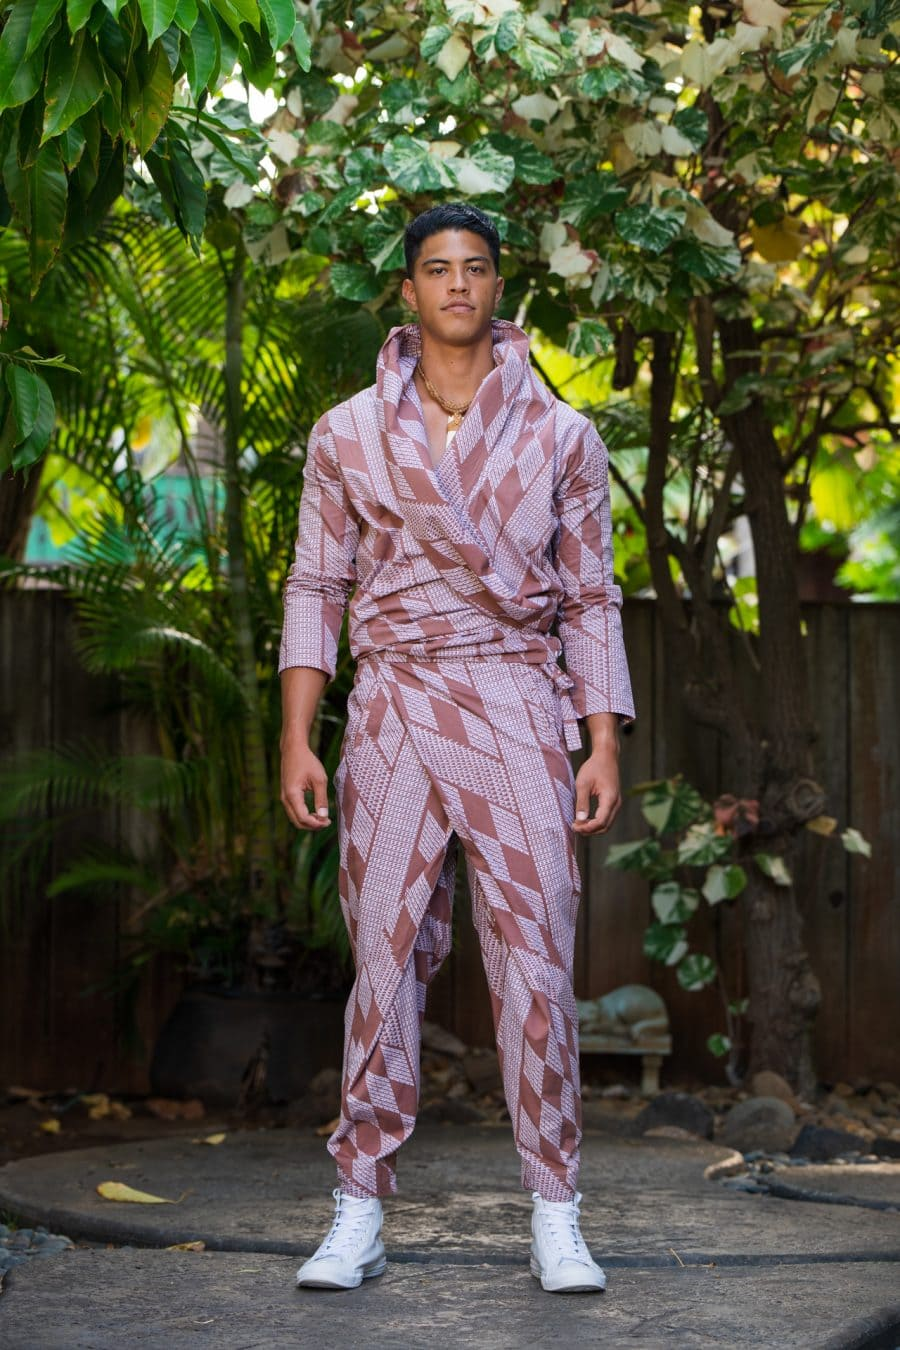 Male model wearing Mohala Jacket in Fired Brick White Kamehahema Pattern - Front View